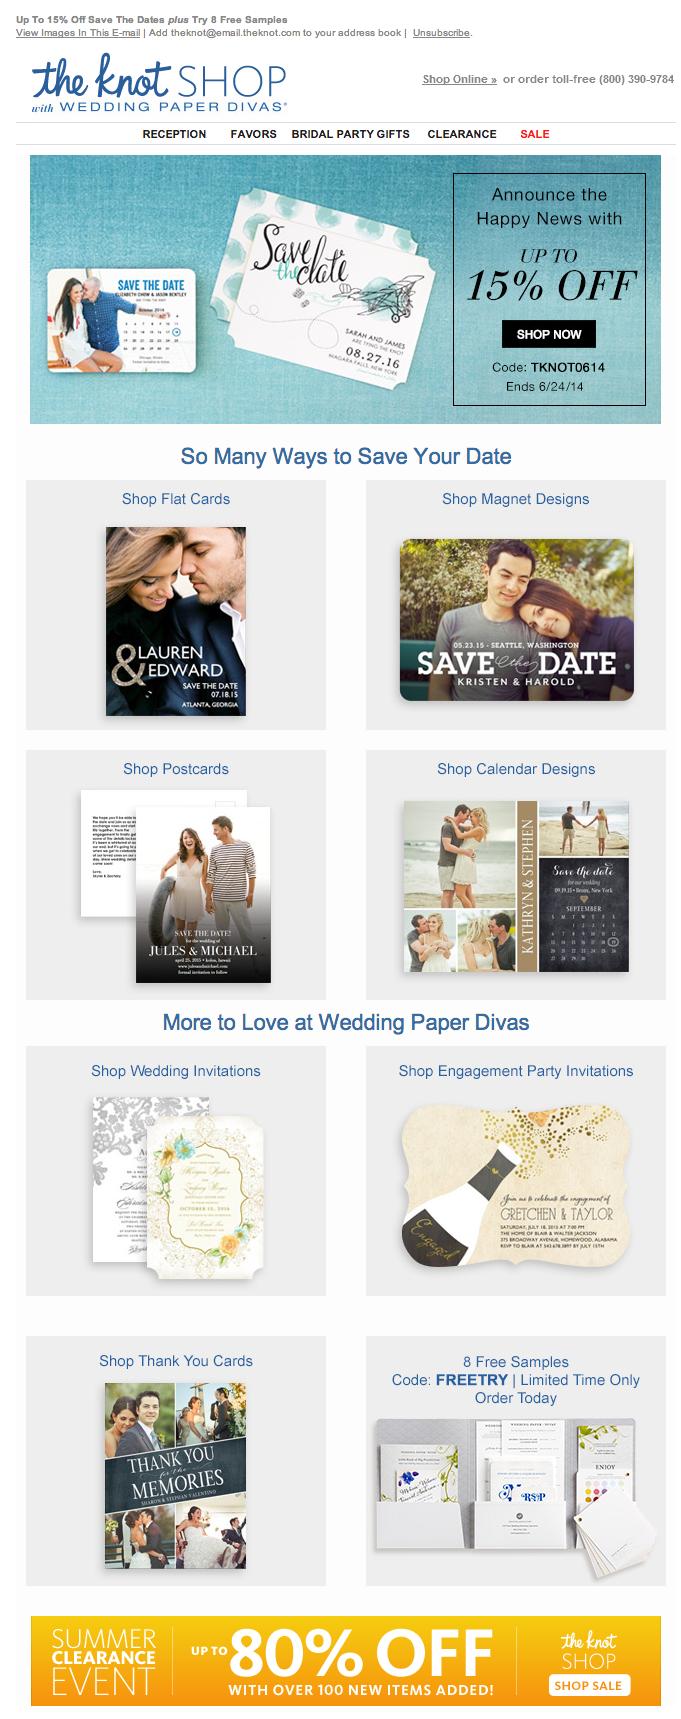 The Knot Wedding registry email 2014 Wedding paper divas